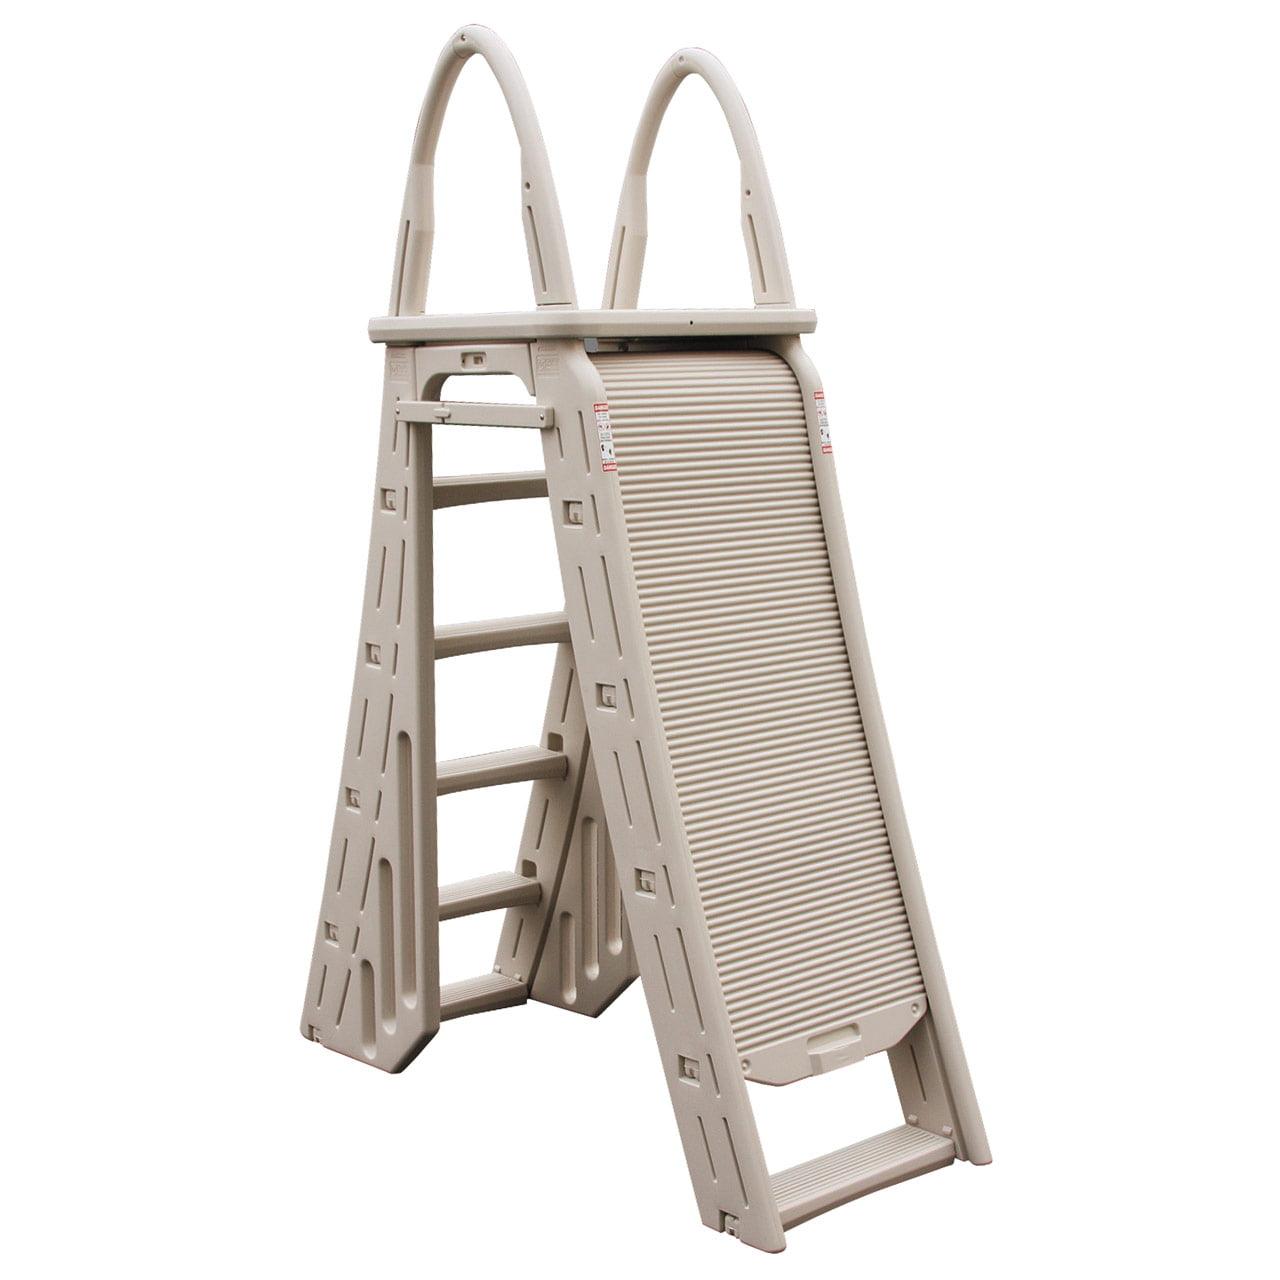 Confer Plastics ROLL-GUARD A-Frame Safety Ladder